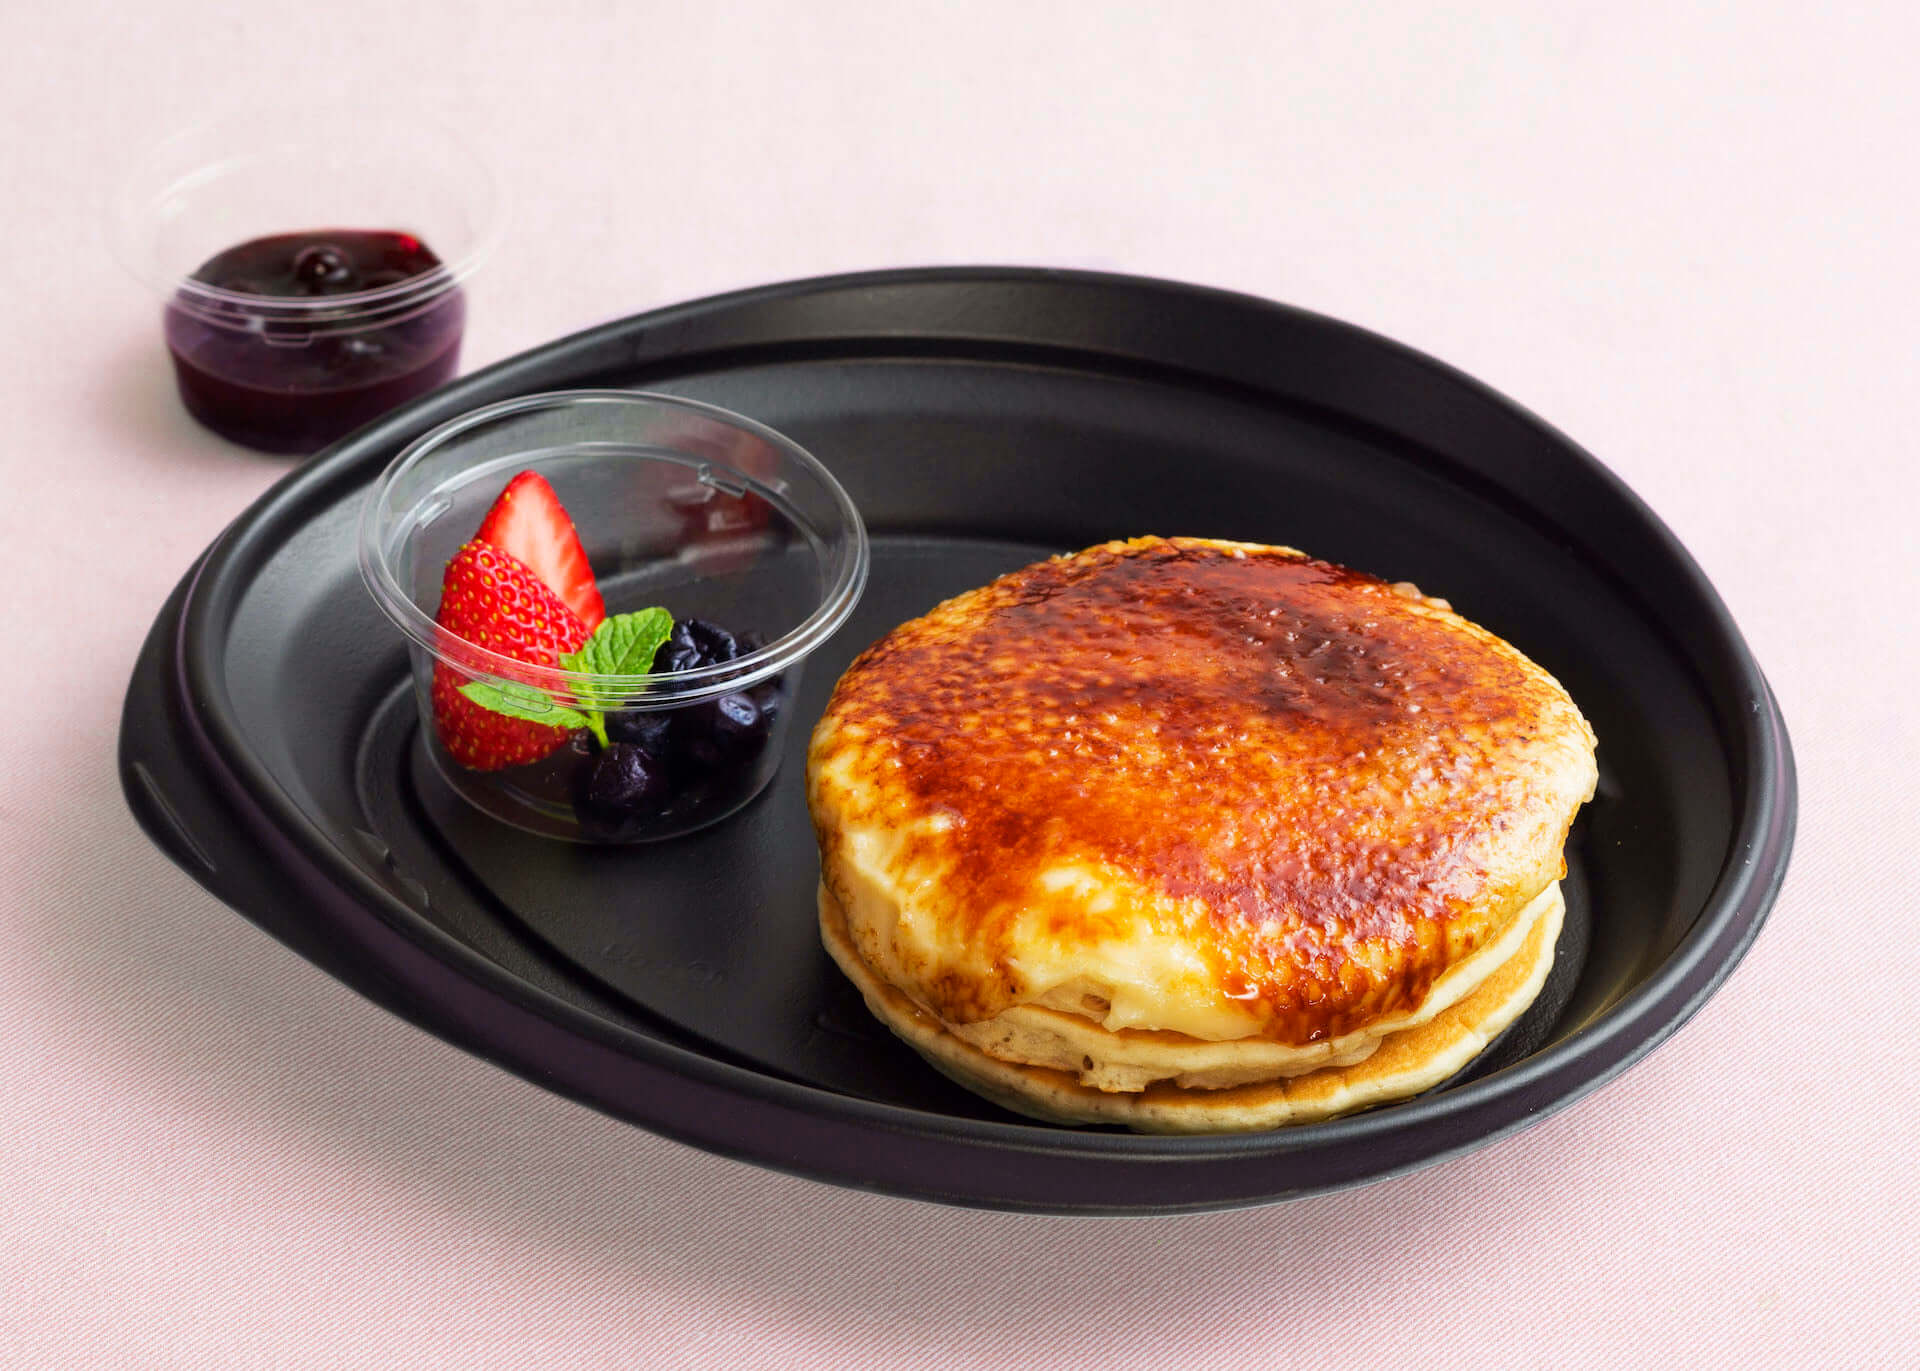 Eggs'n Thingsから、季節限定『クリームチーズのブリュレパンケーキ』『モッツァレラチーズとバジルチキンのホットサンド』が登場! gourmet200604_eggsnthings_02-1920x1371